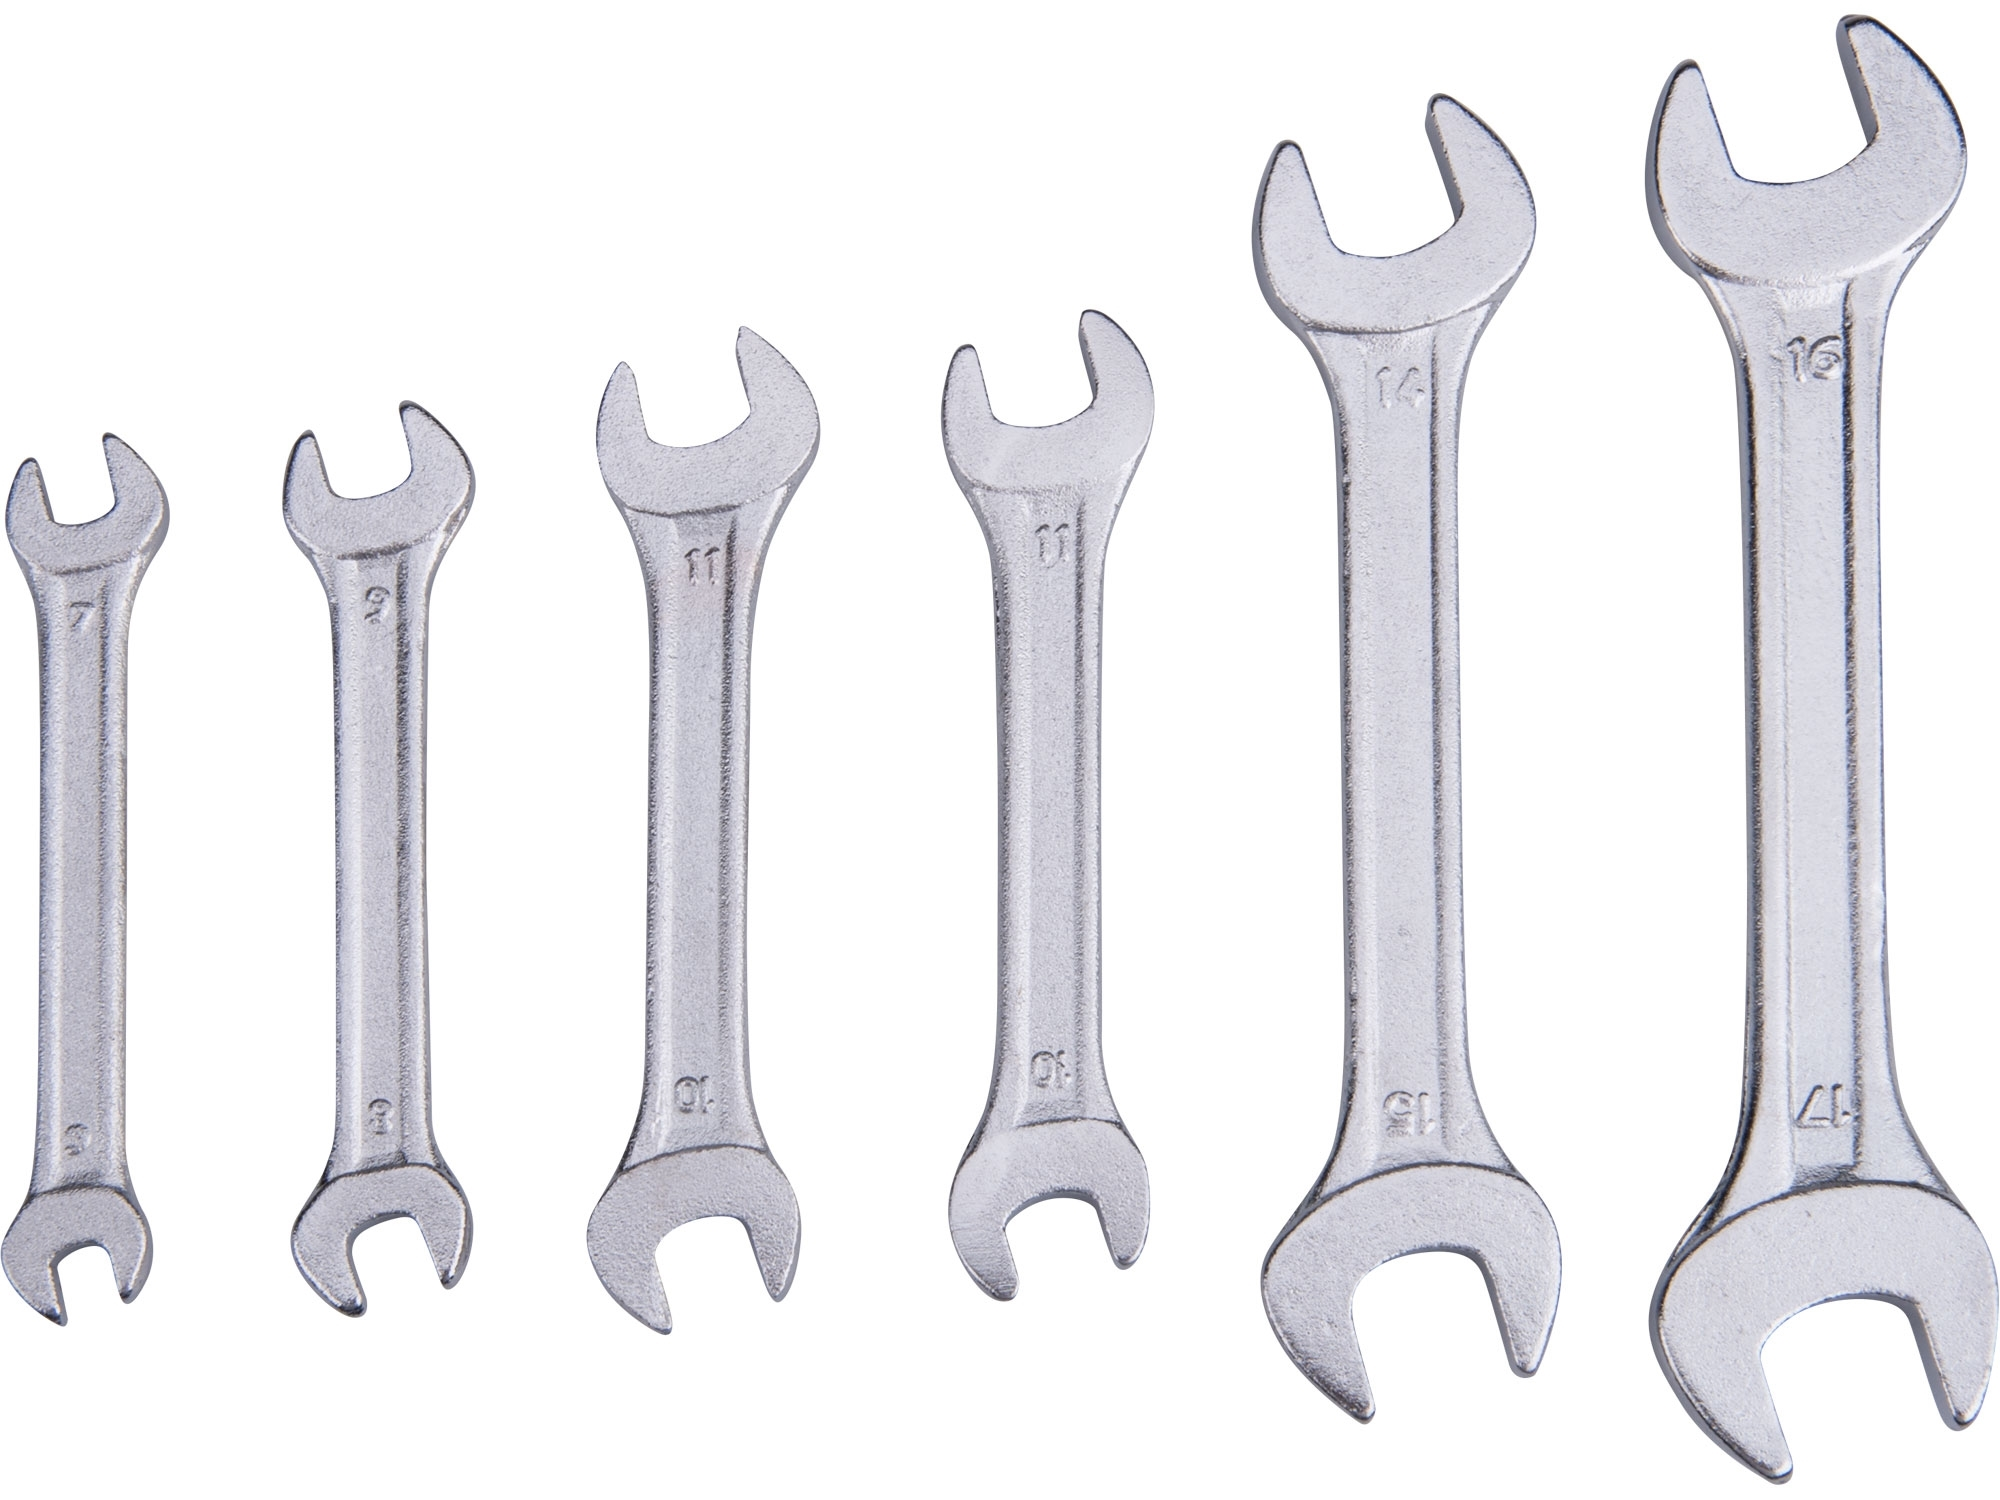 klíče ploché, sada 6ks, 6-17mm, EXTOL CRAFT 6106B